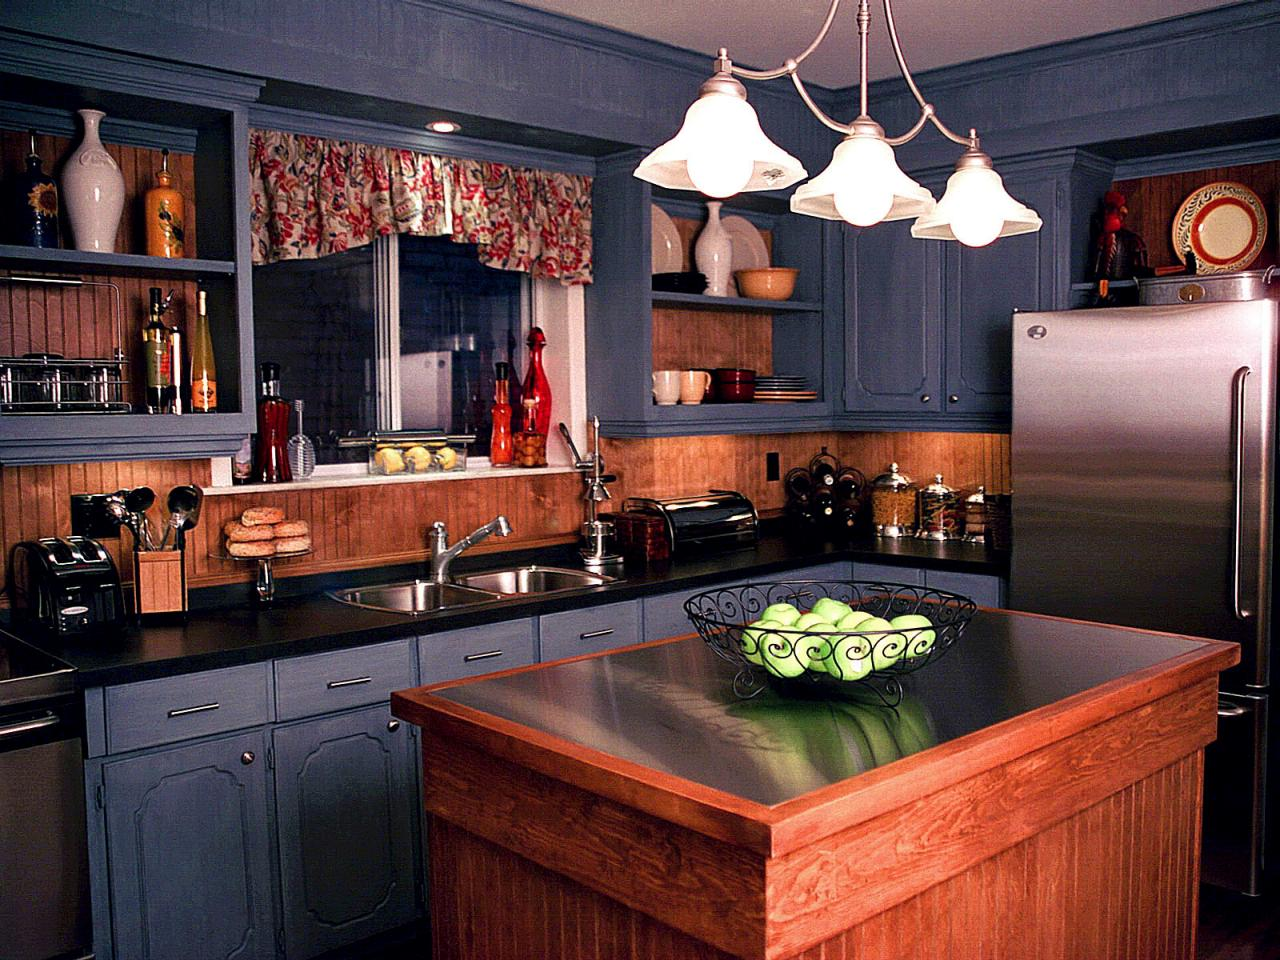 Older Home Kitchen Remodeling Ideas | Roy Home Design on Small Kitchen:jdu_Ojl7Plw= Kitchen Remodeling Ideas  id=20588